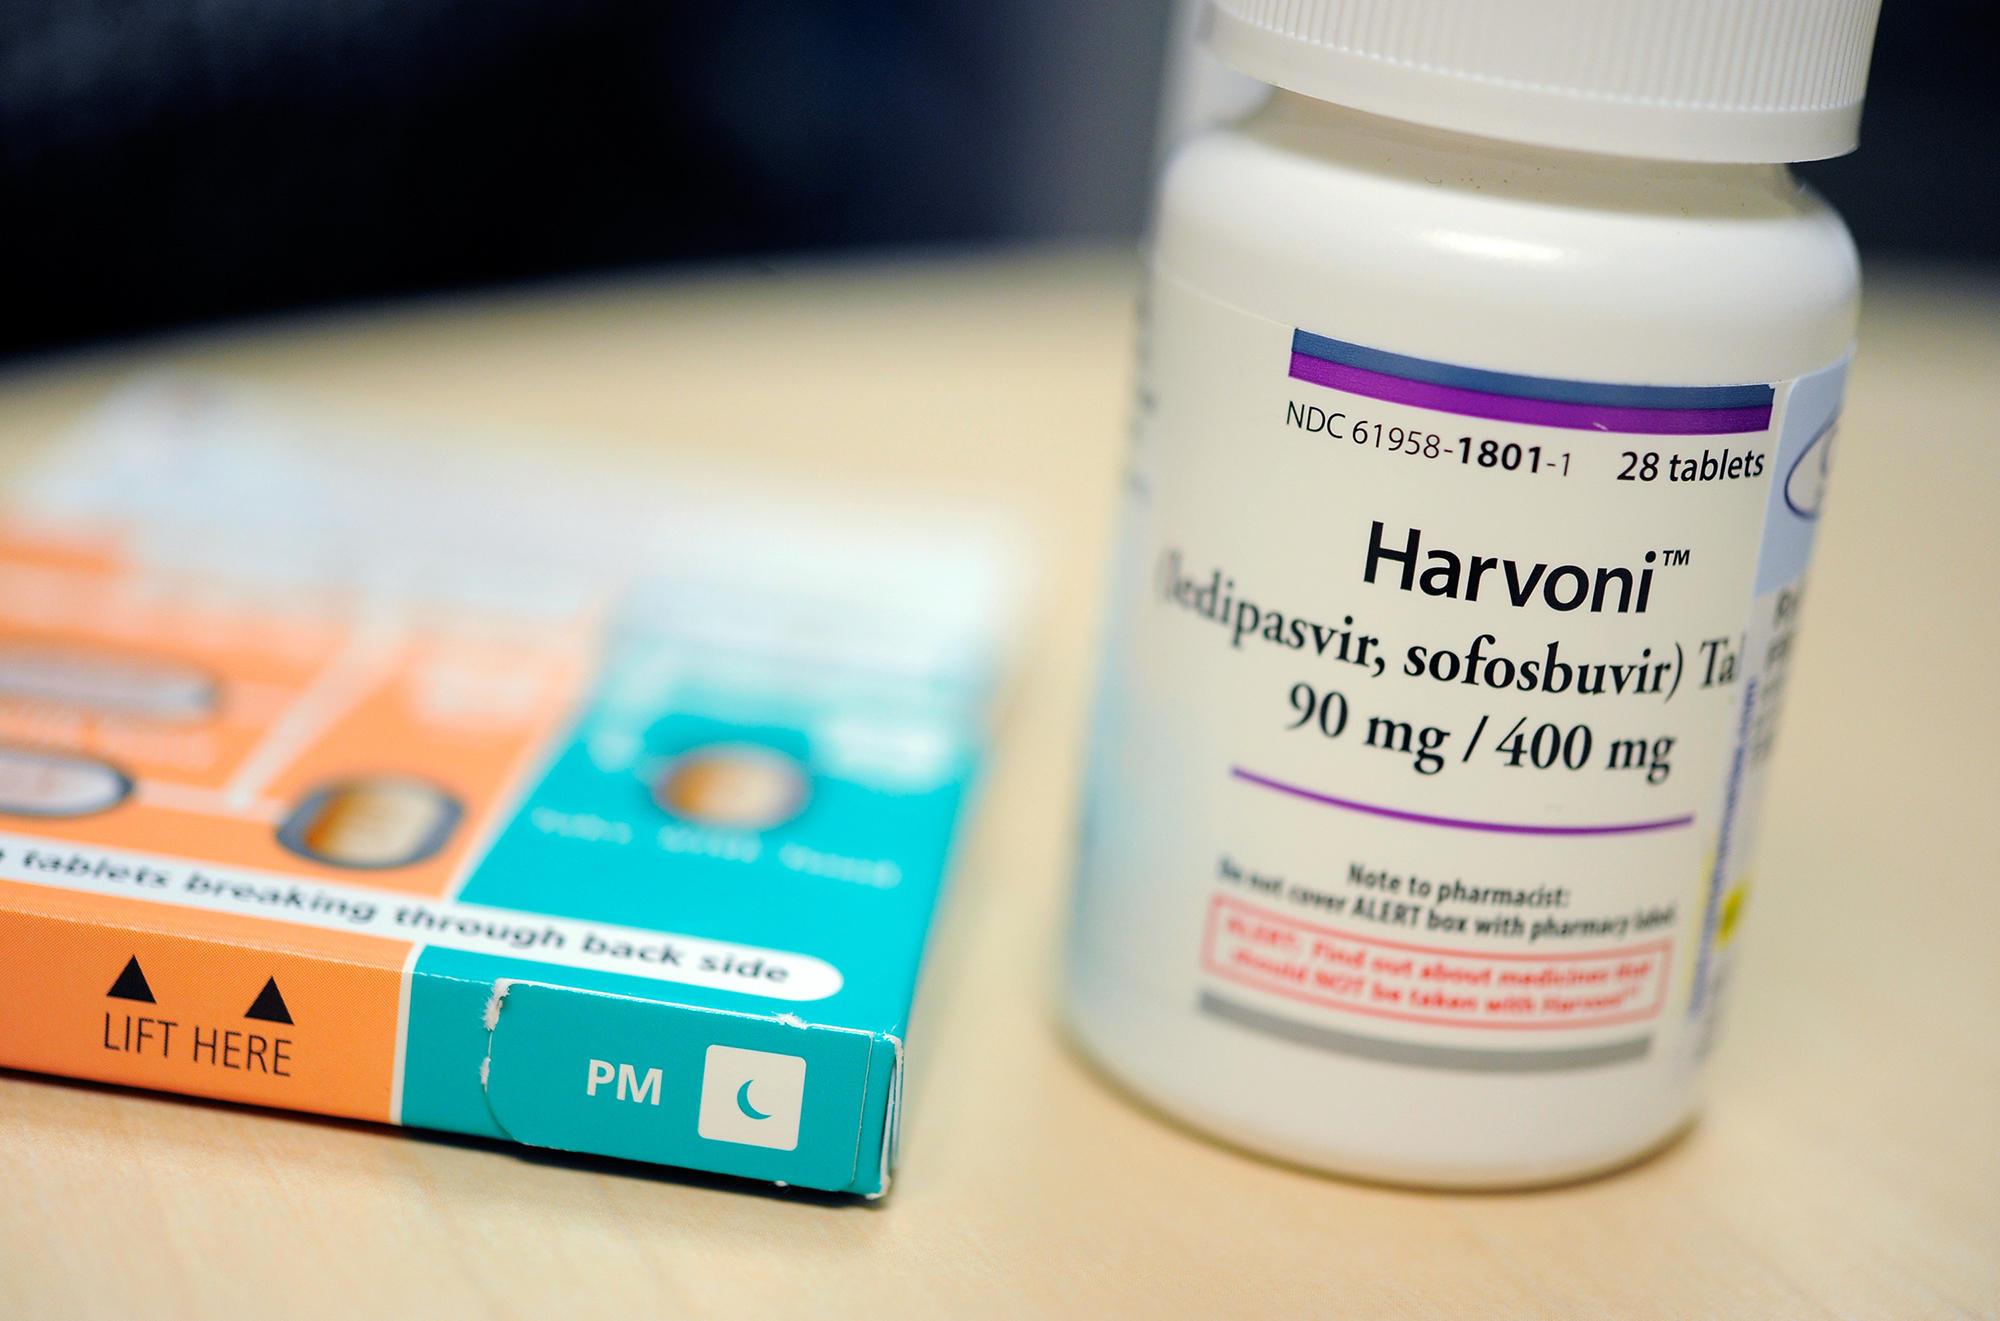 Learn about Hepatitis C virus this World Hepatitis Day